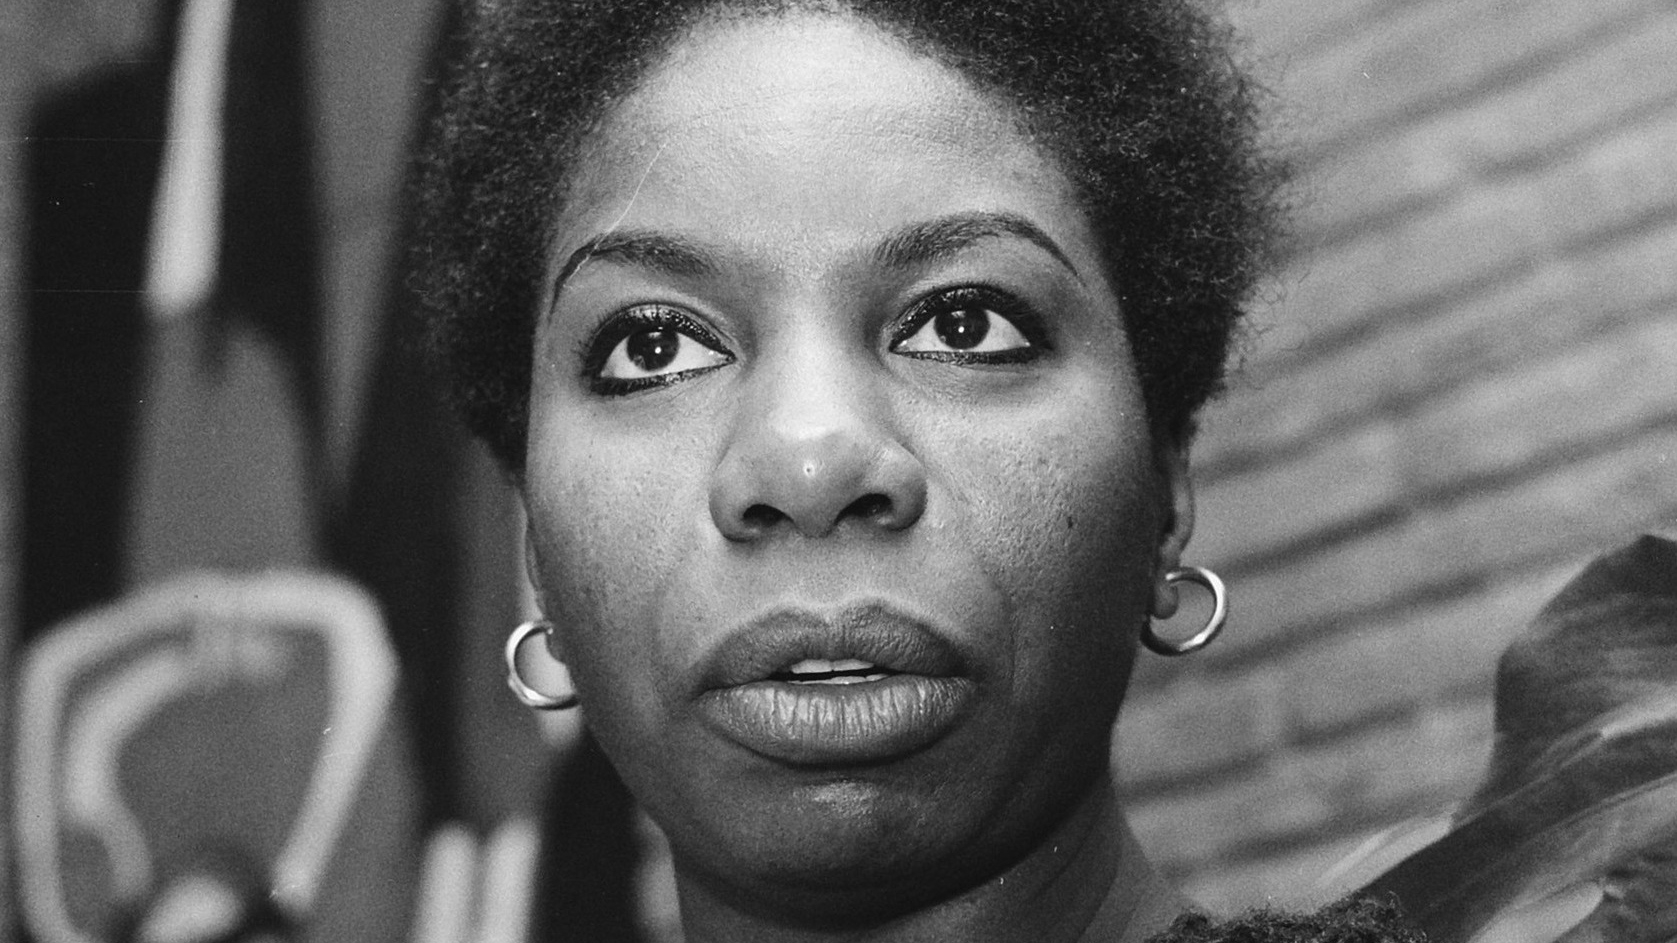 Nina Simone - Mississippi goddamn